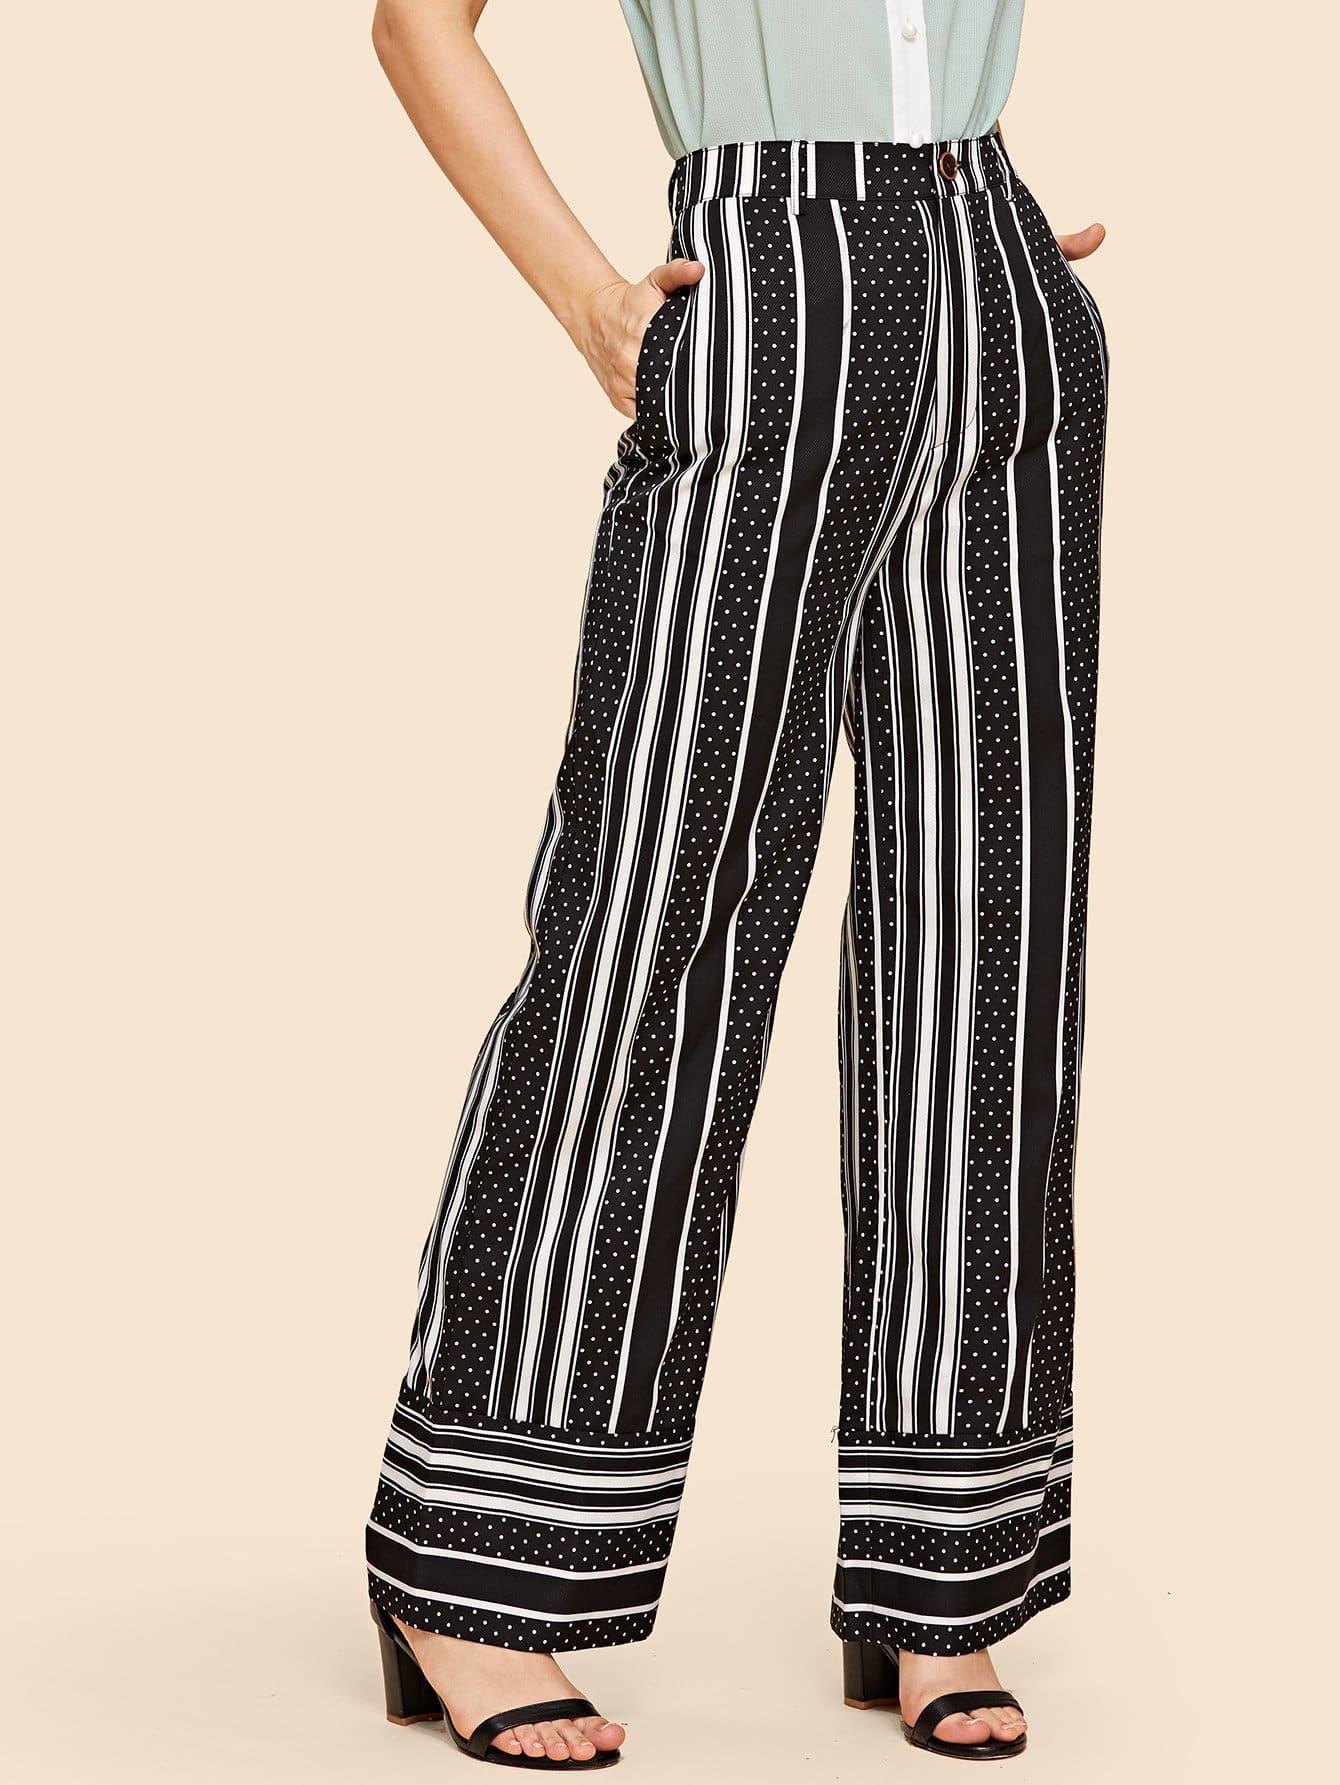 Striped and Dot Print Wide Leg Pants платье yumi yumi платье